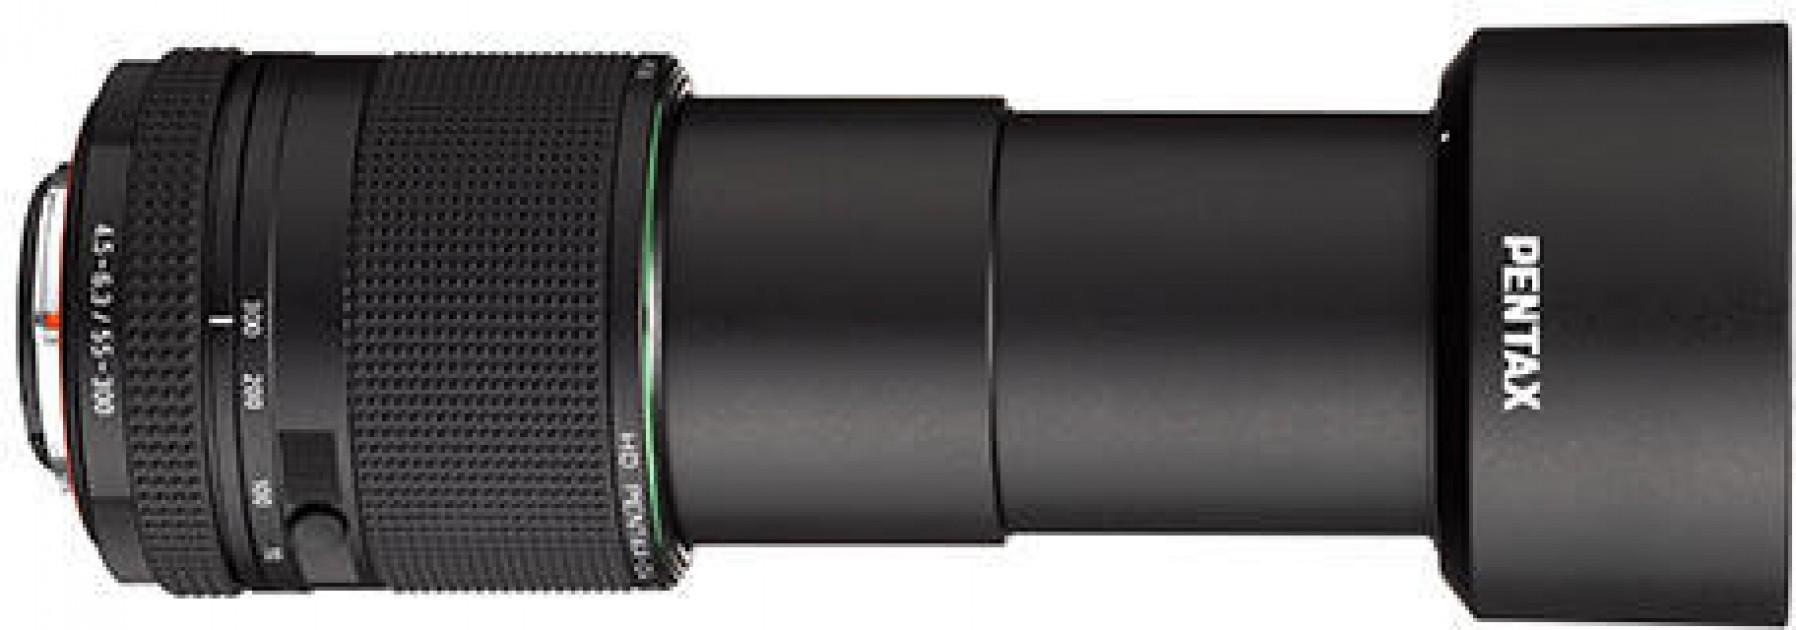 Hd Pentax Da 55 300mm F4 5 6 3ed Plm Wr Re Photography Blog